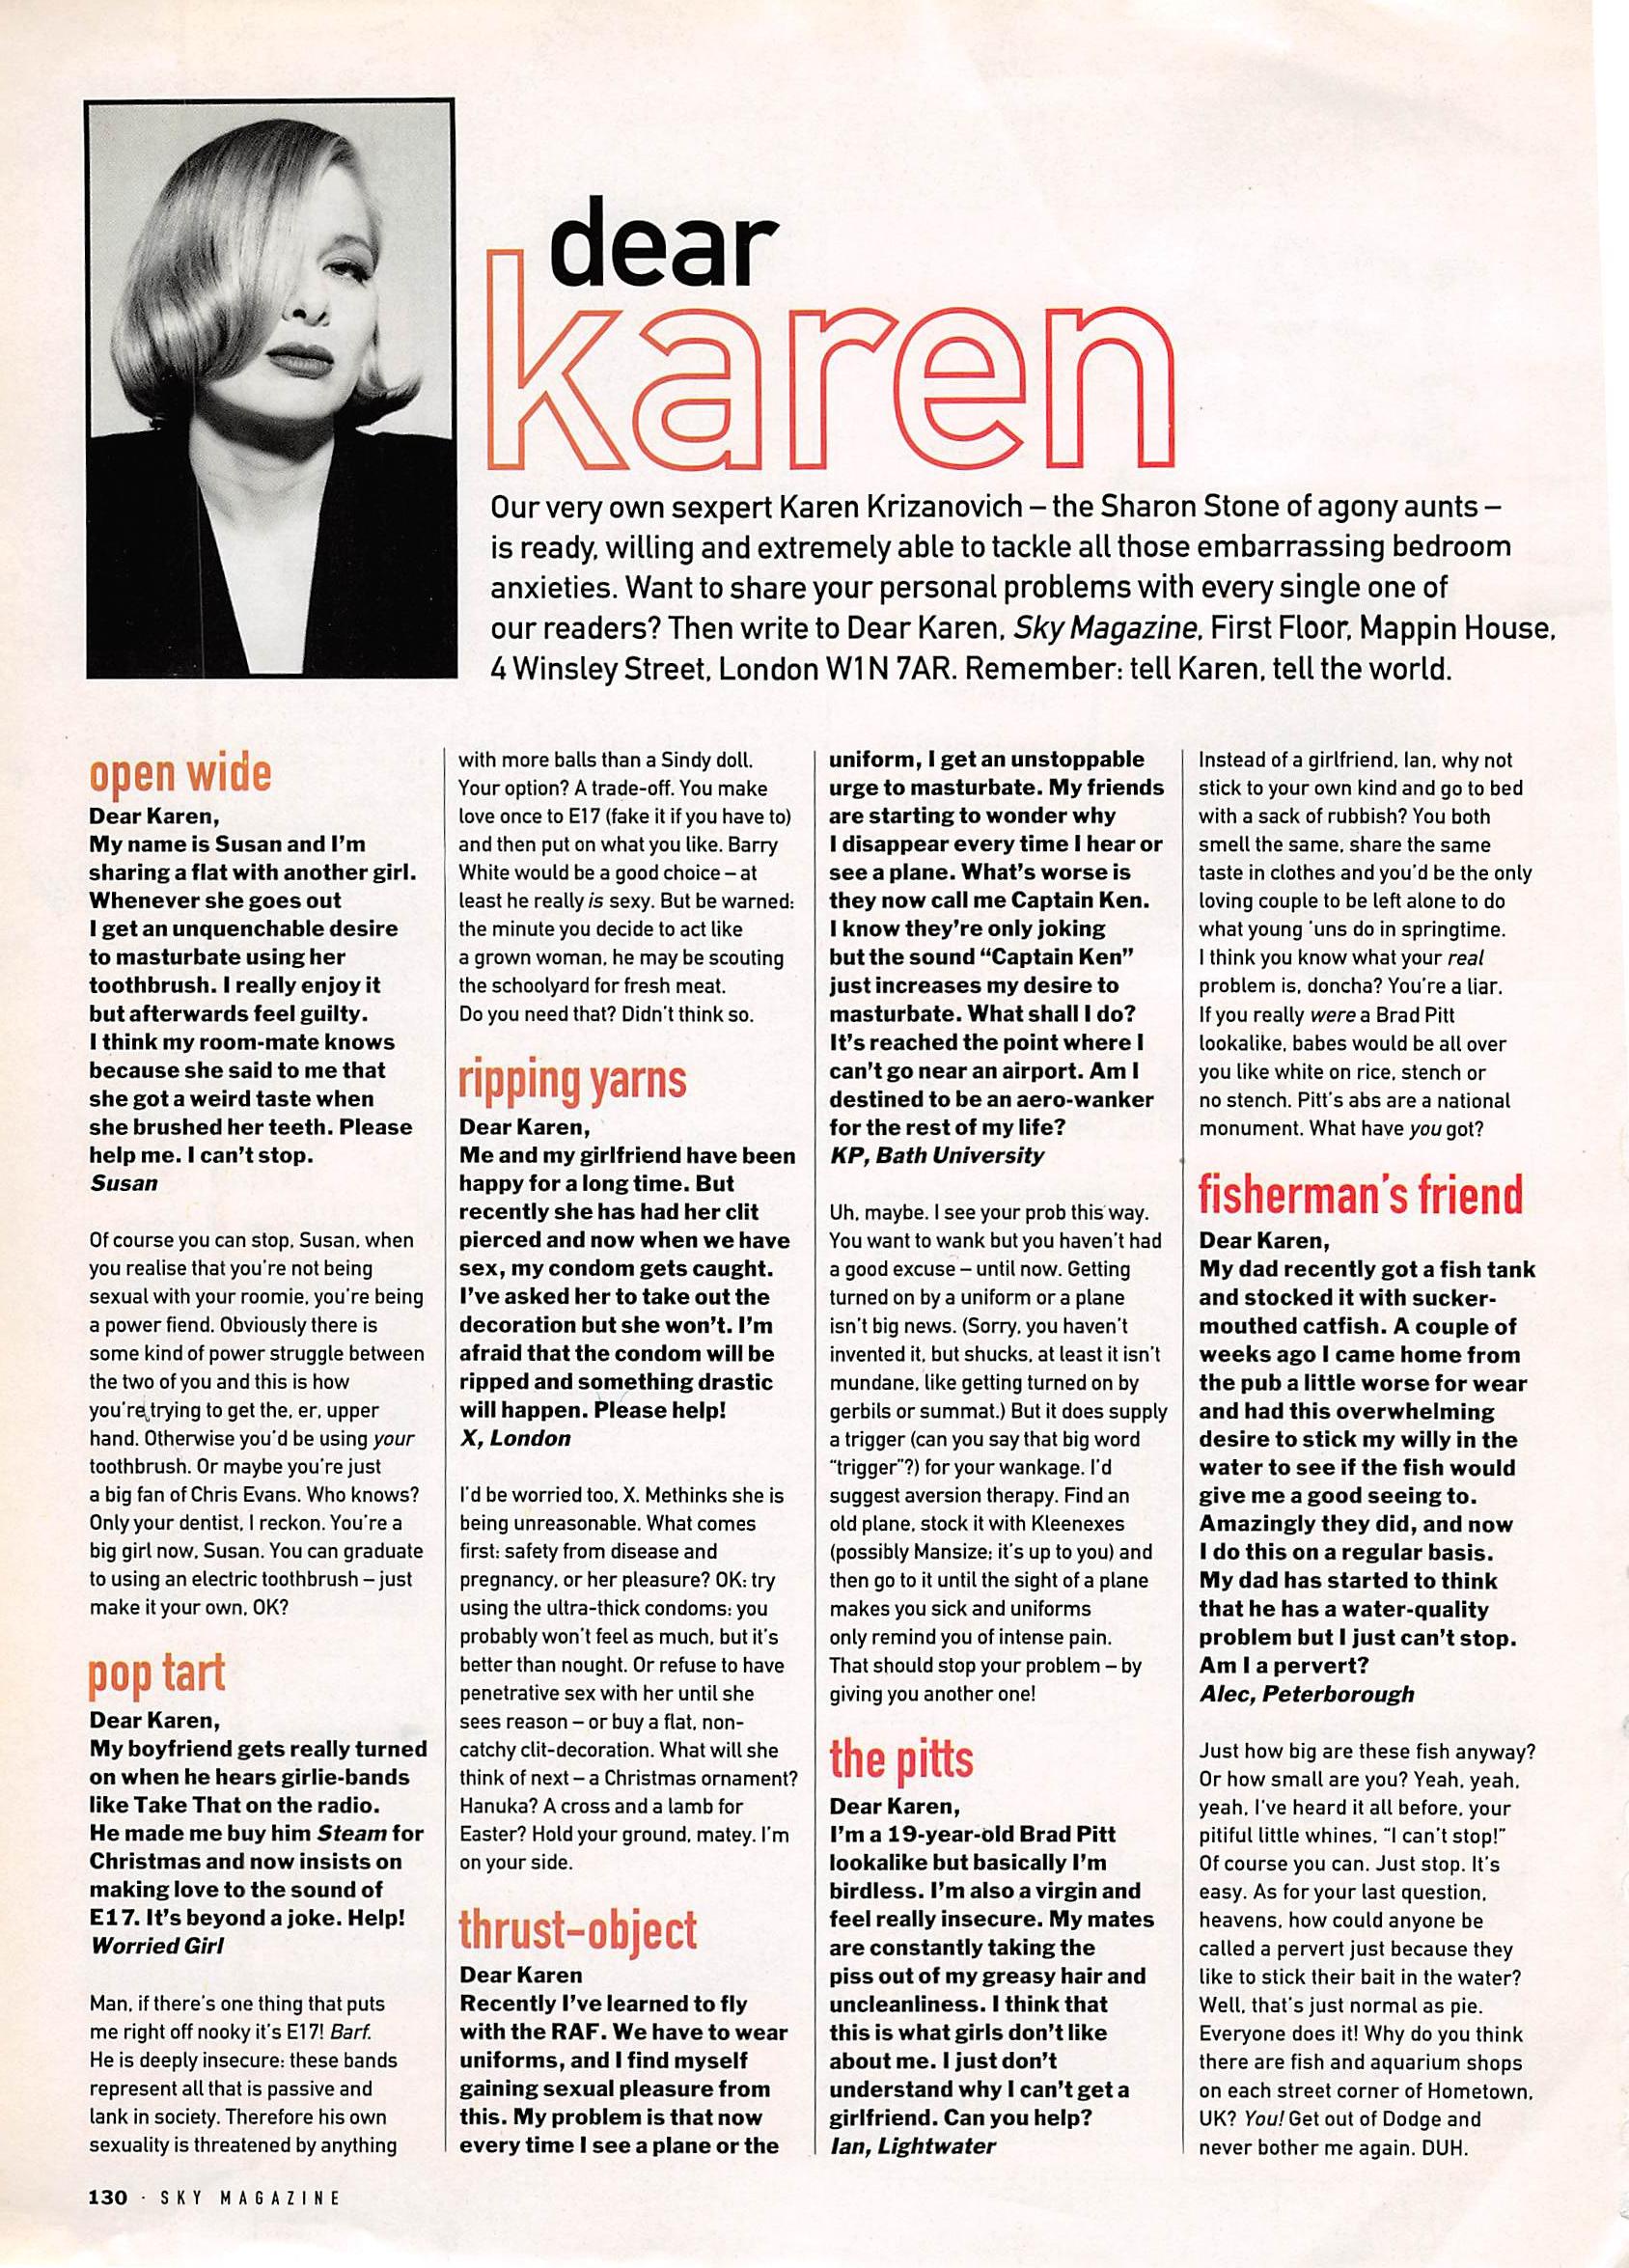 openwide | Karen Krizanovich